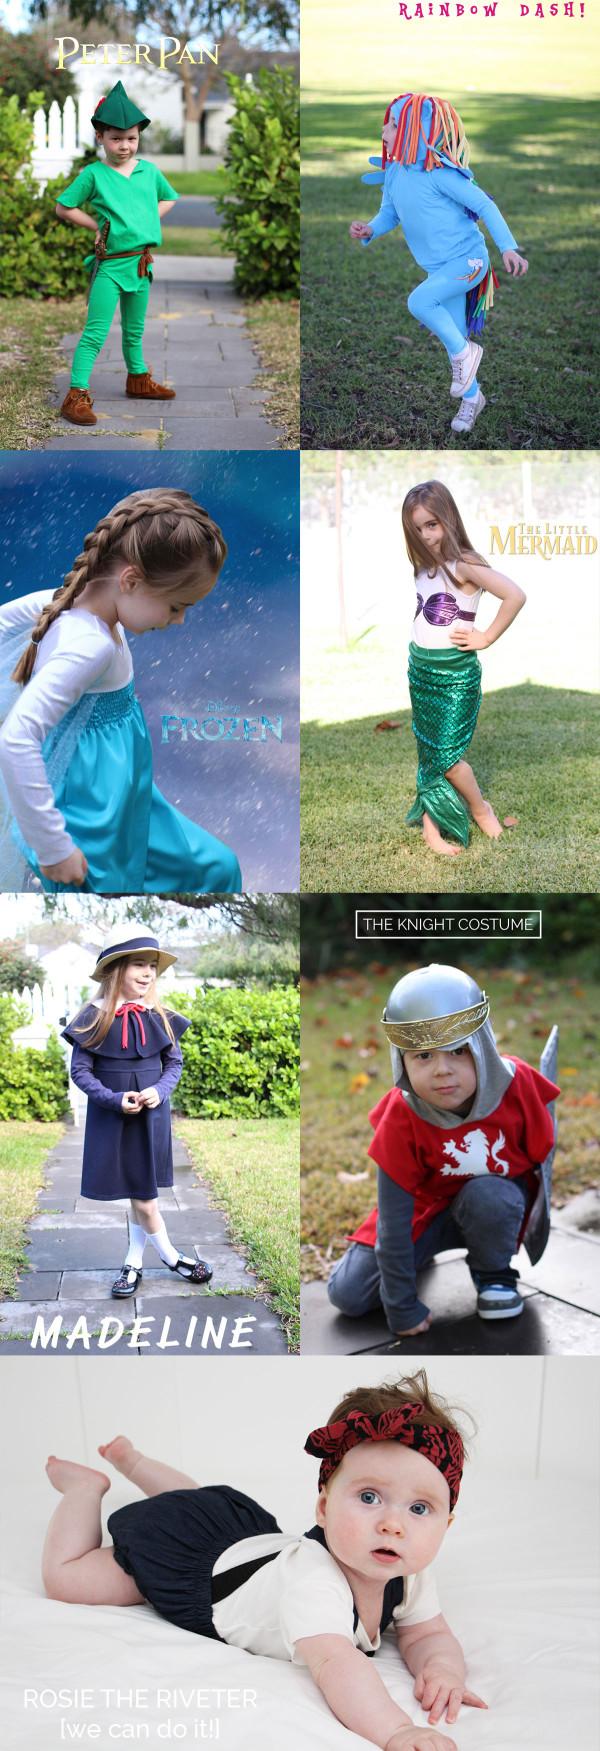 DIY Halloween costumes for kids by Megan Nielsen Patterns